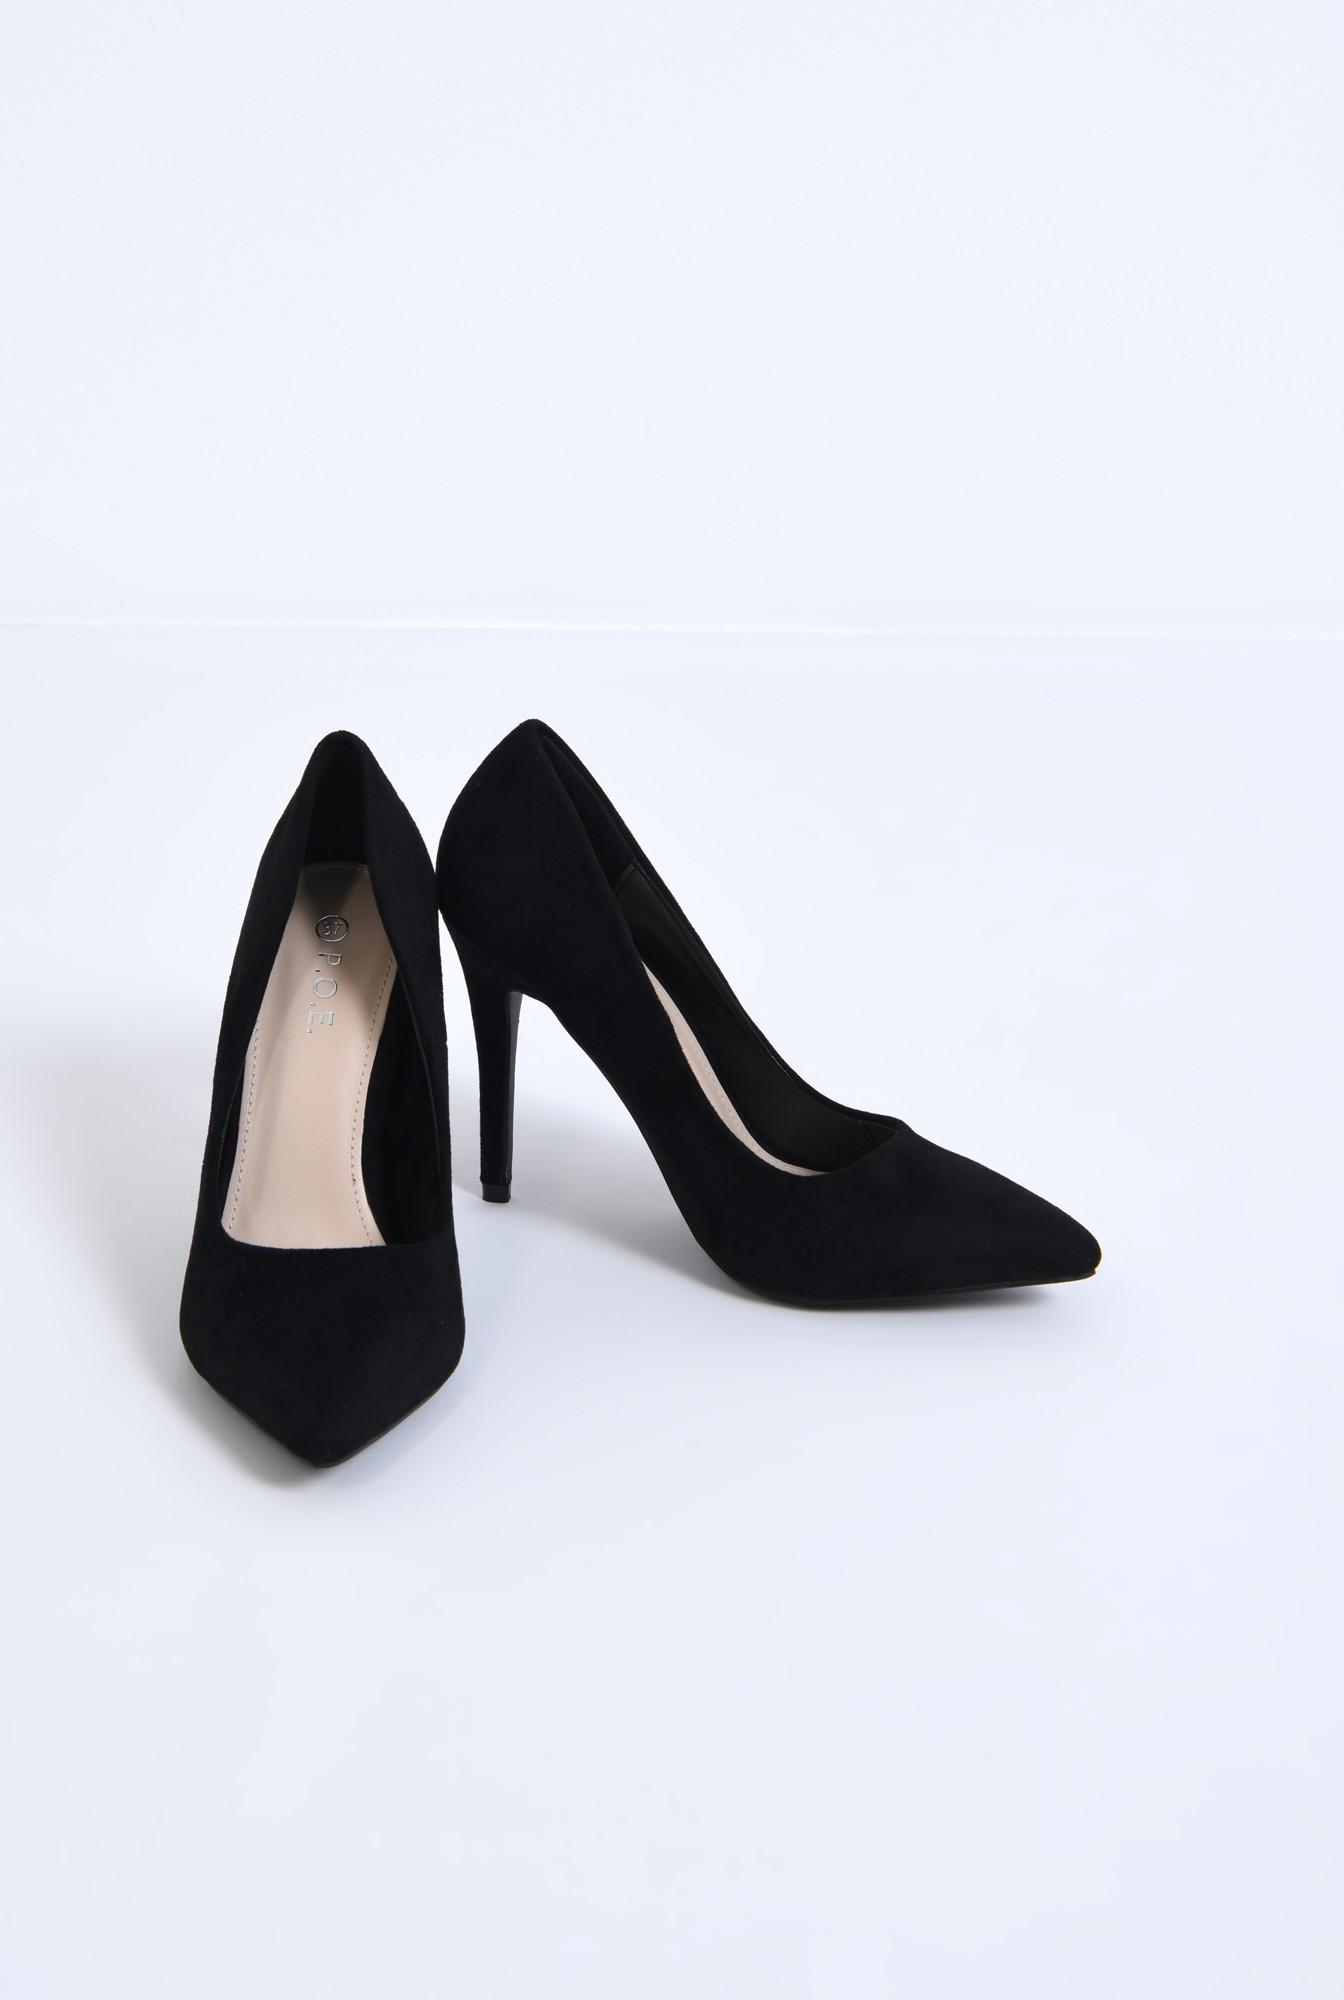 3 - pantofi casual, negru, stiletto